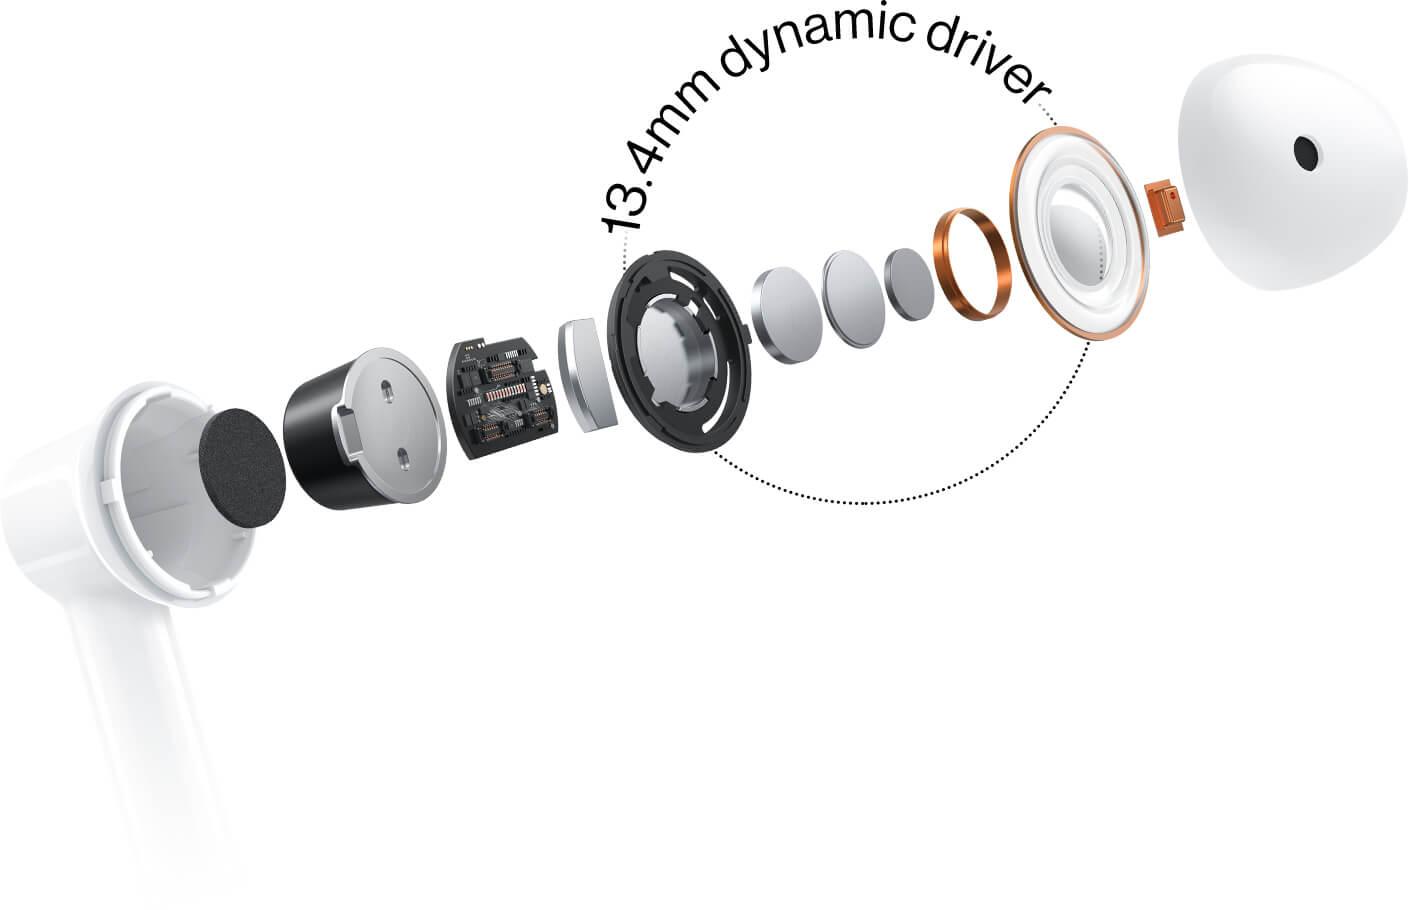 OnePlus Buds Dynamic Driver Design